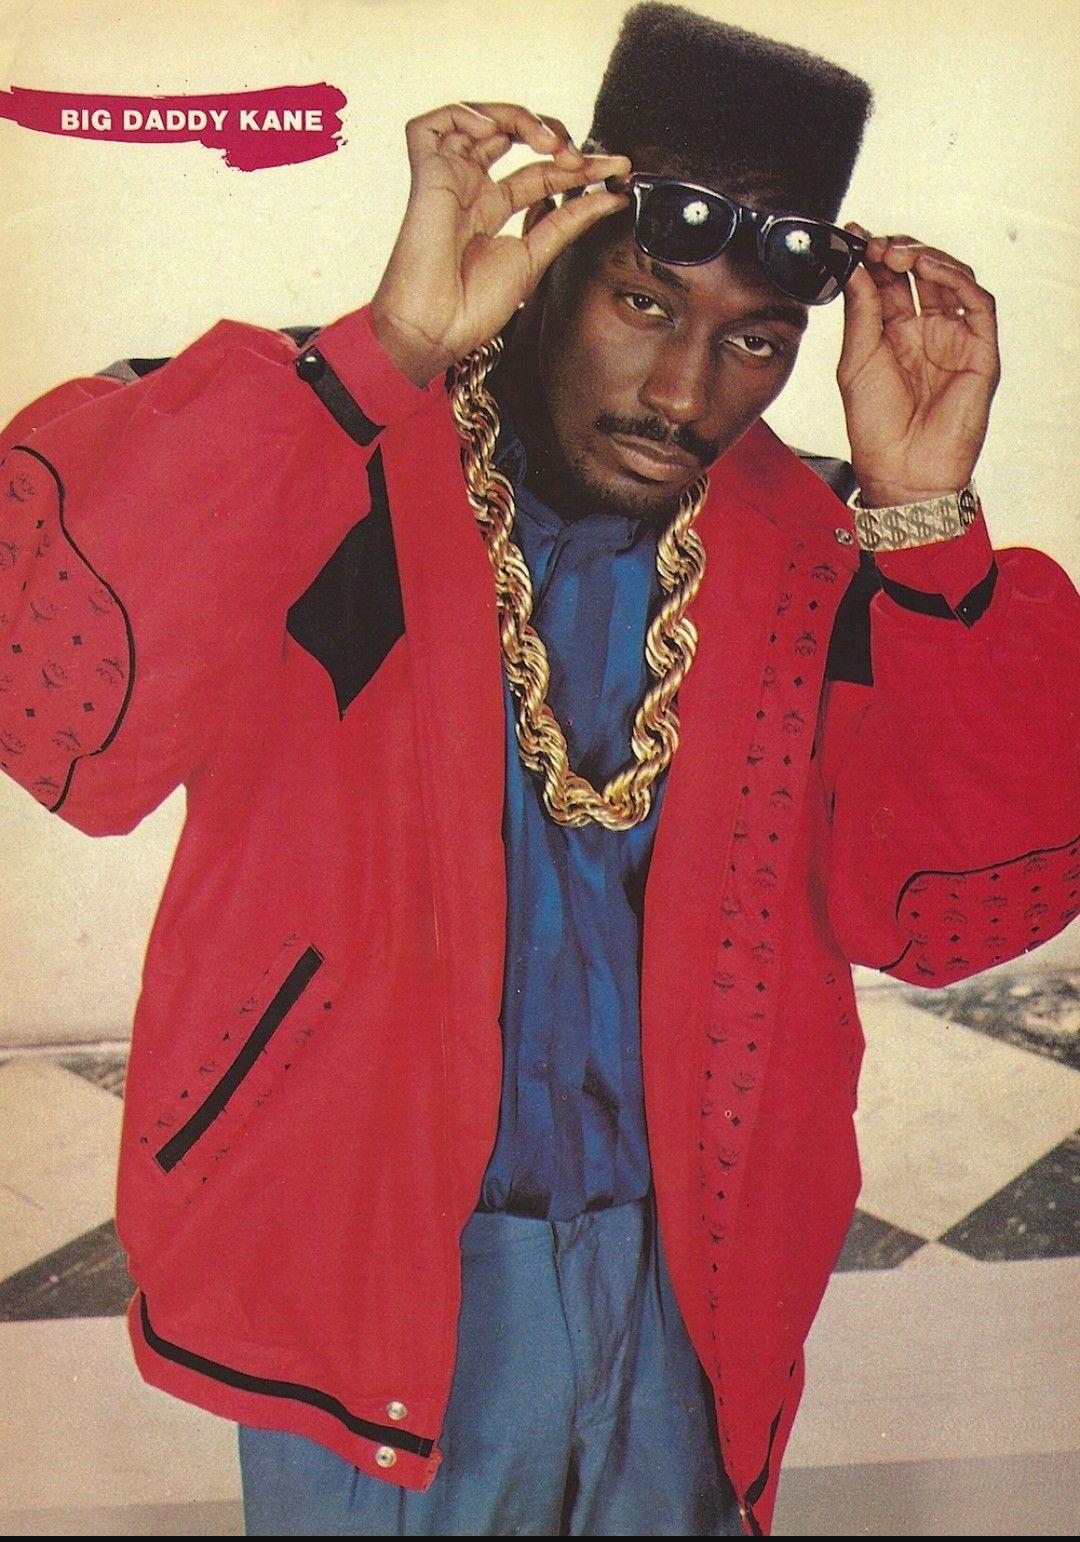 Big daddy kane big daddy kane history of hip hop